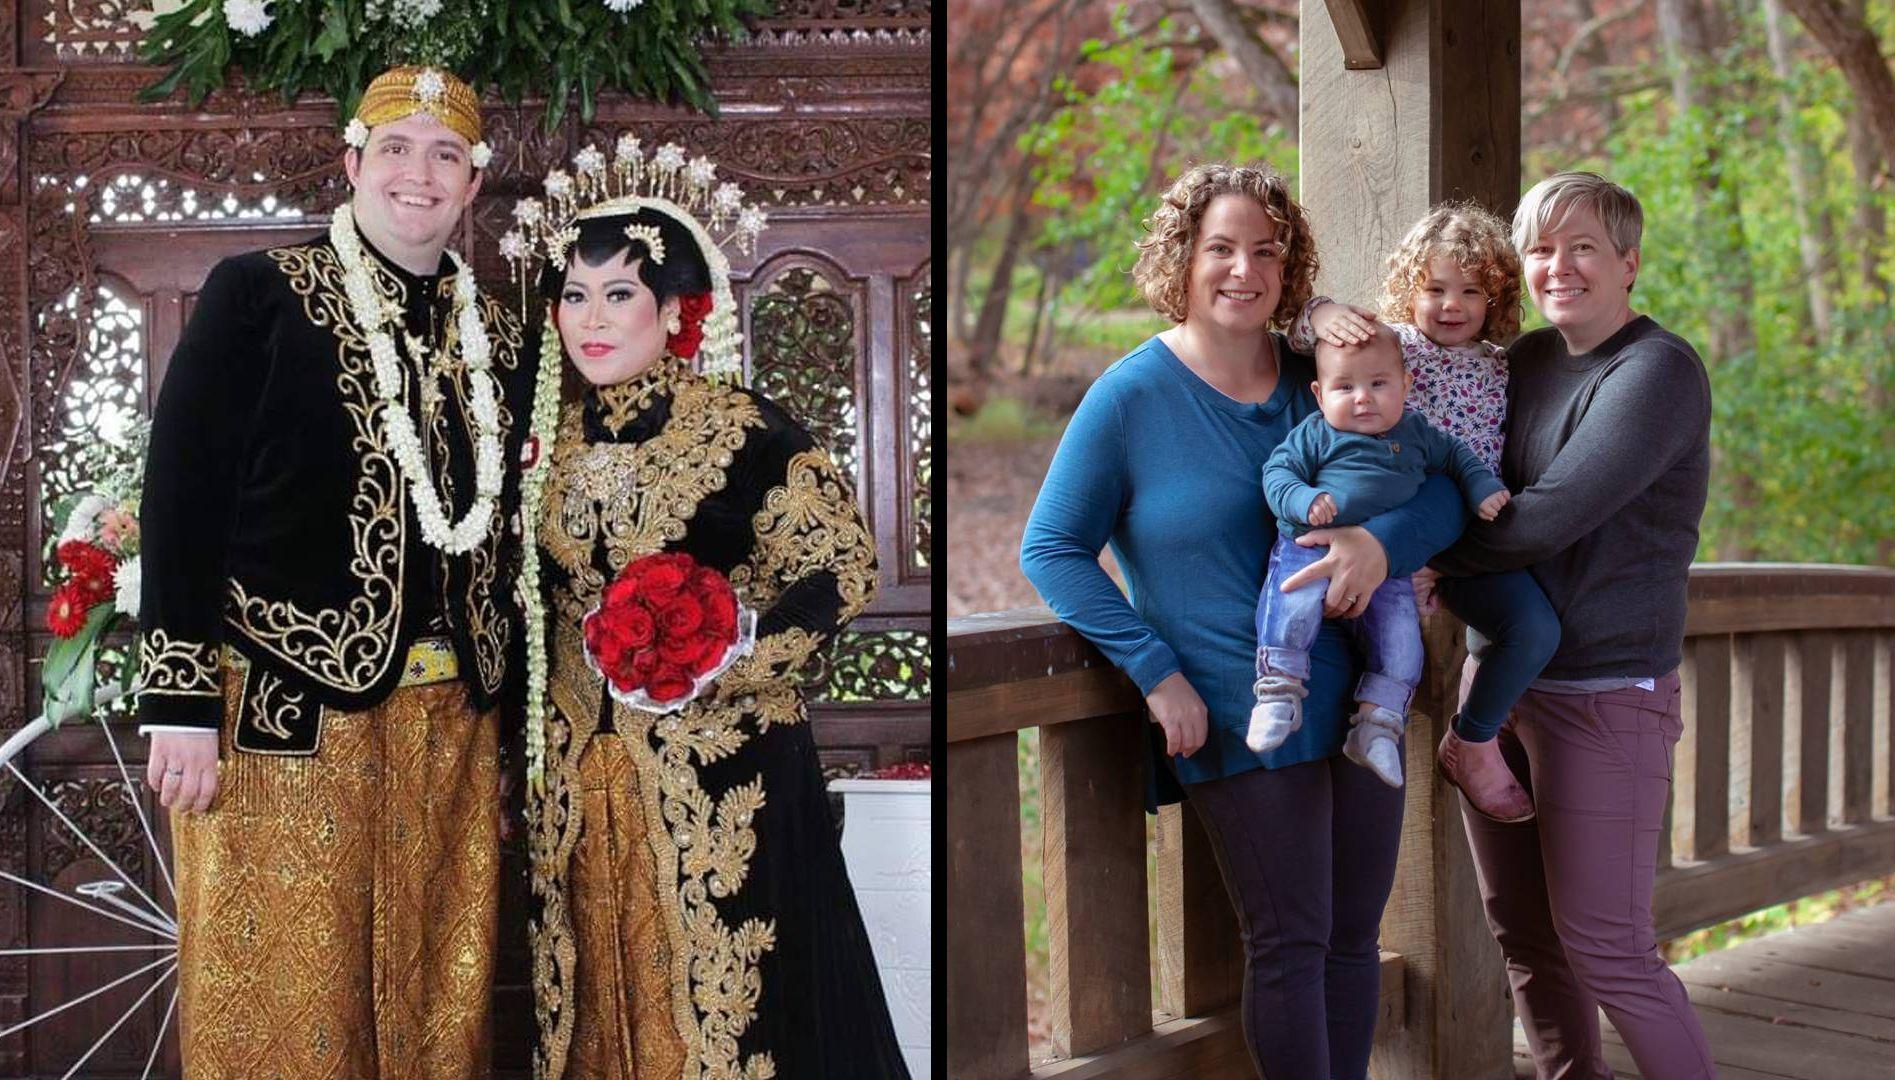 two interreligious couples. rewire pbs love interreligious couples rewire pbs love